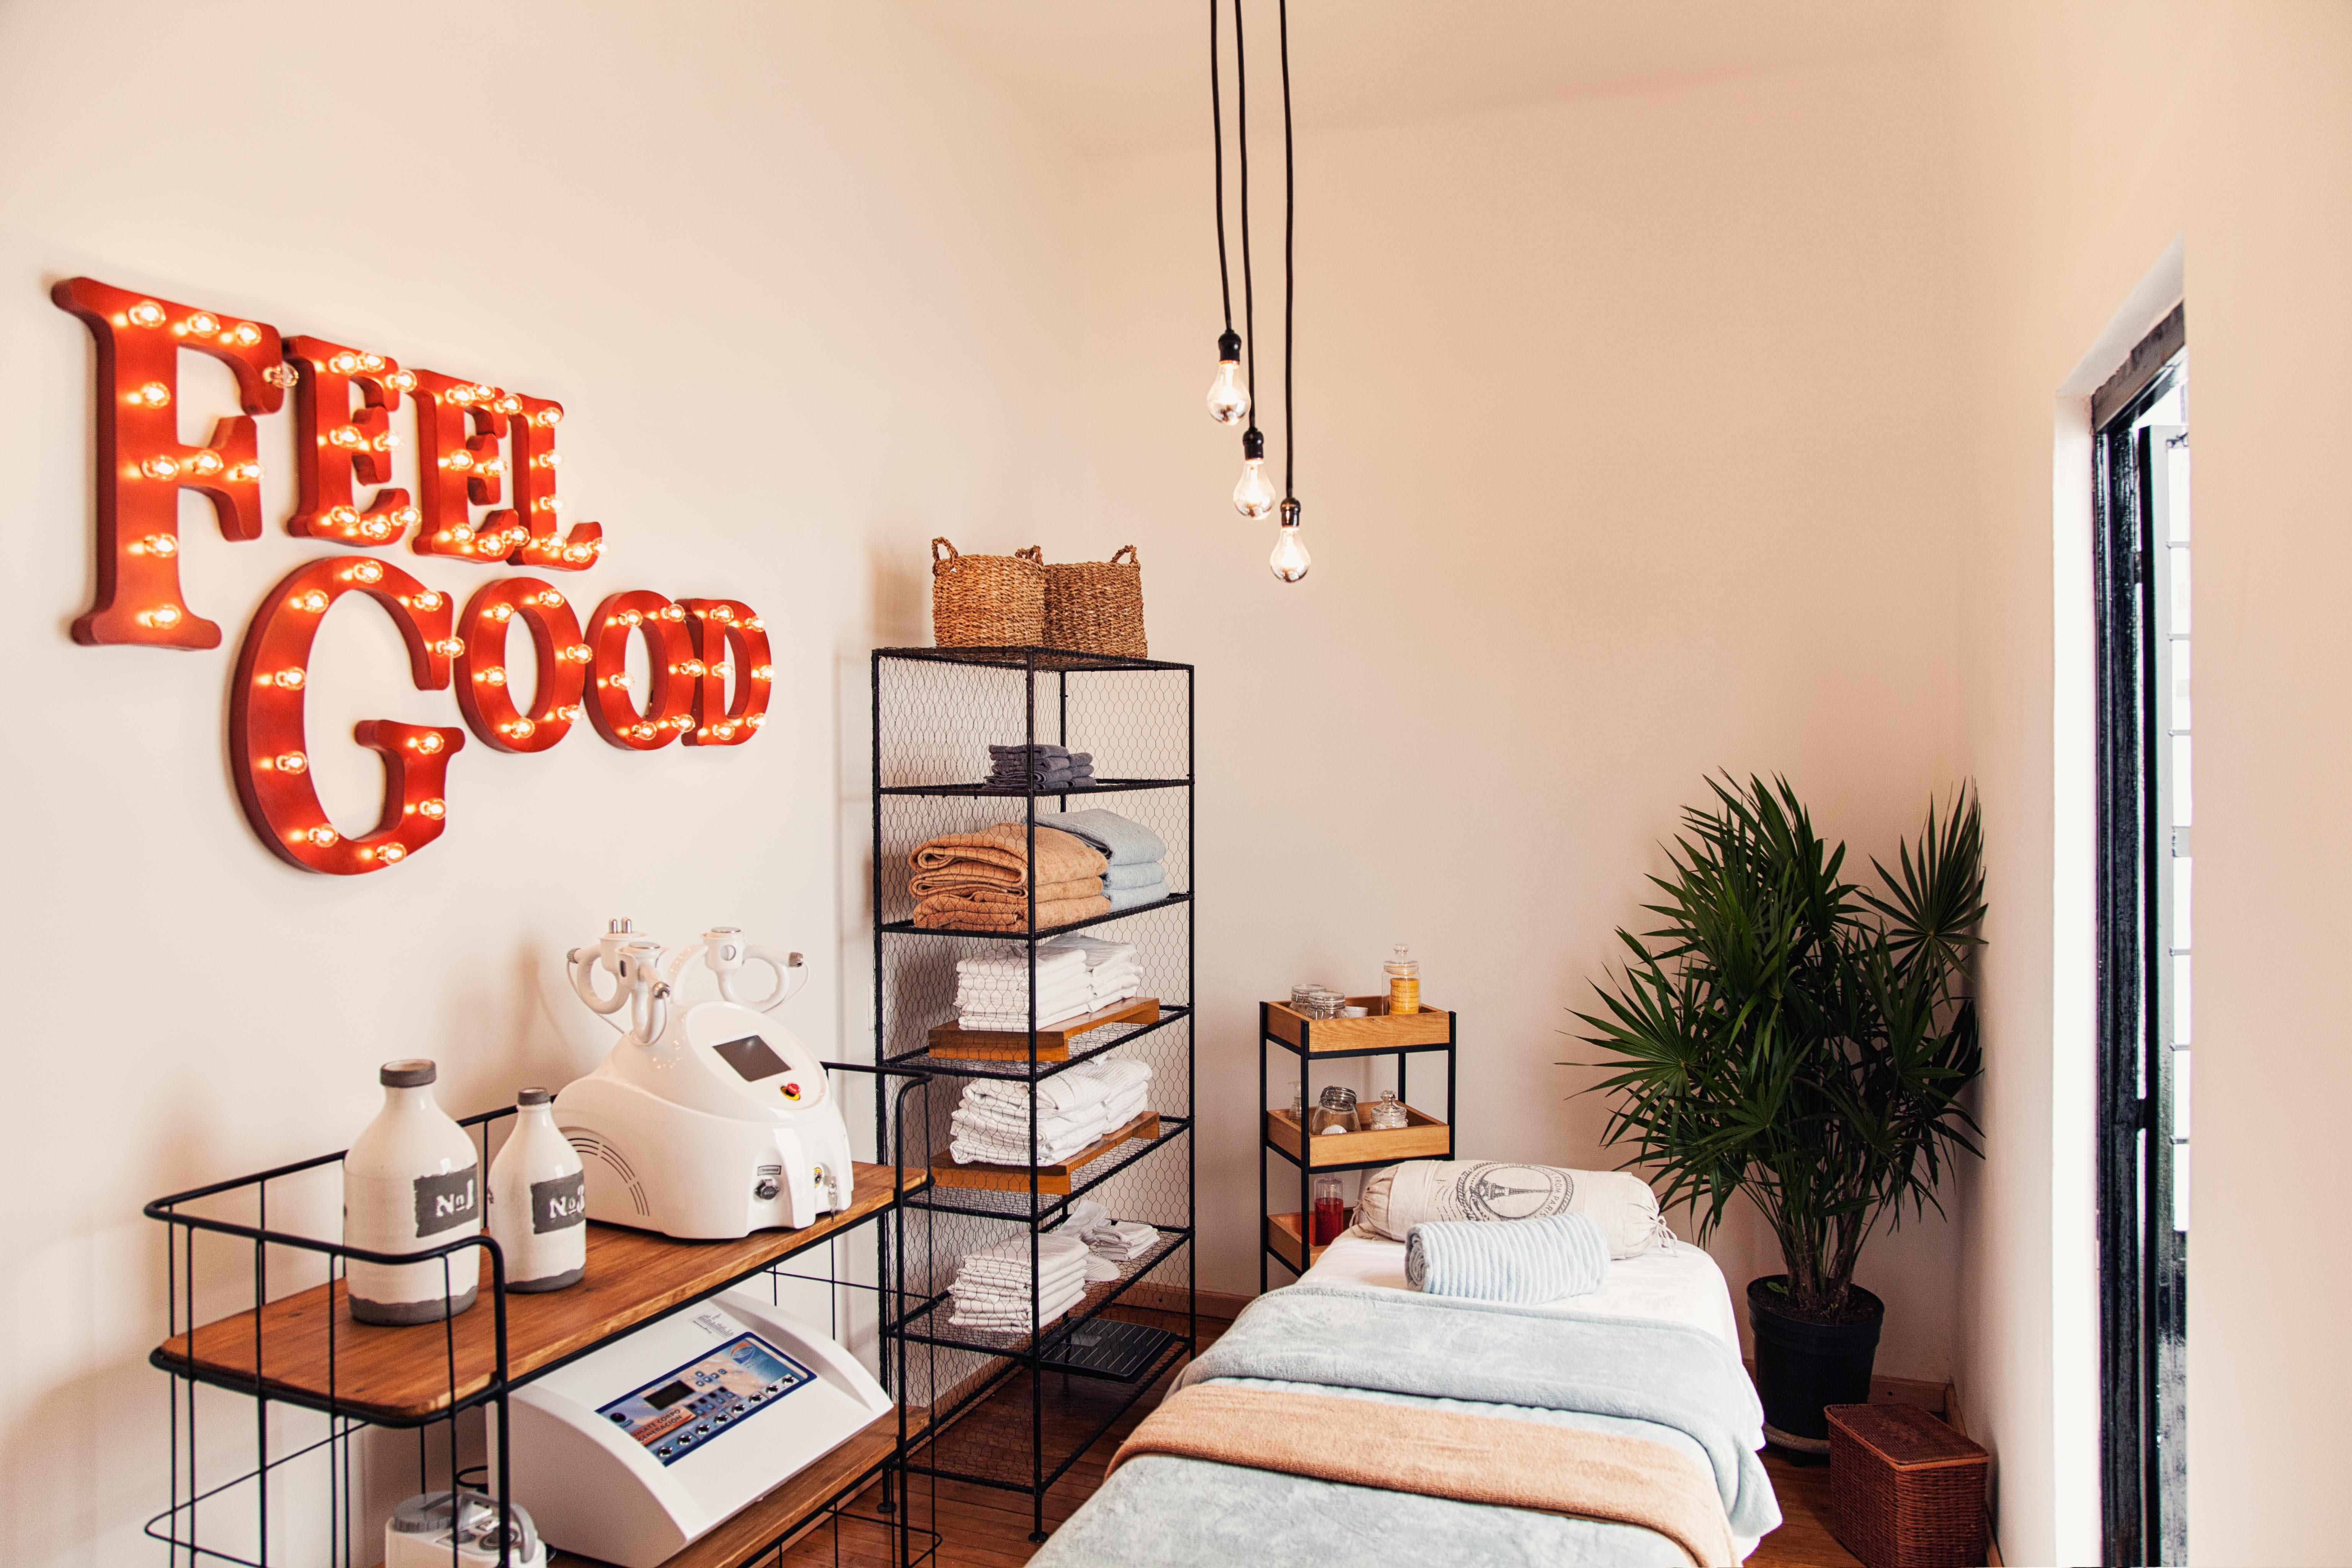 Rese a de spa tina belo soyactitud - Objetos decorativos salon ...